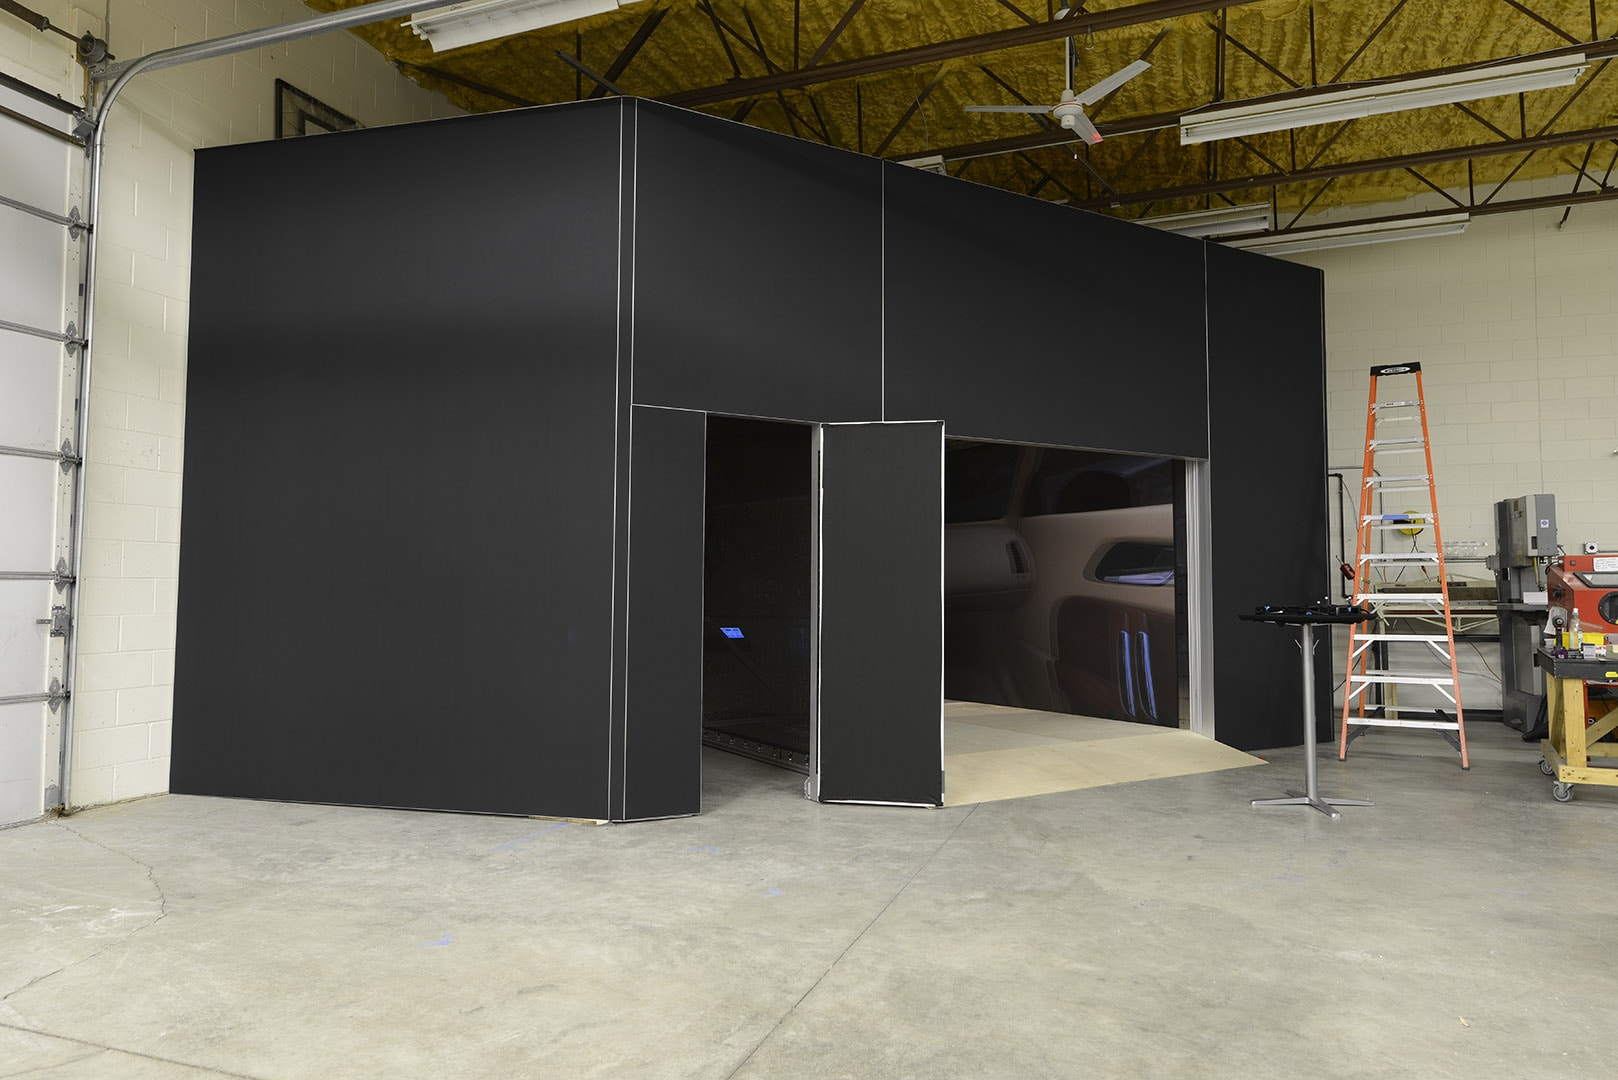 IGI custom fabrication CAVE system HD projection